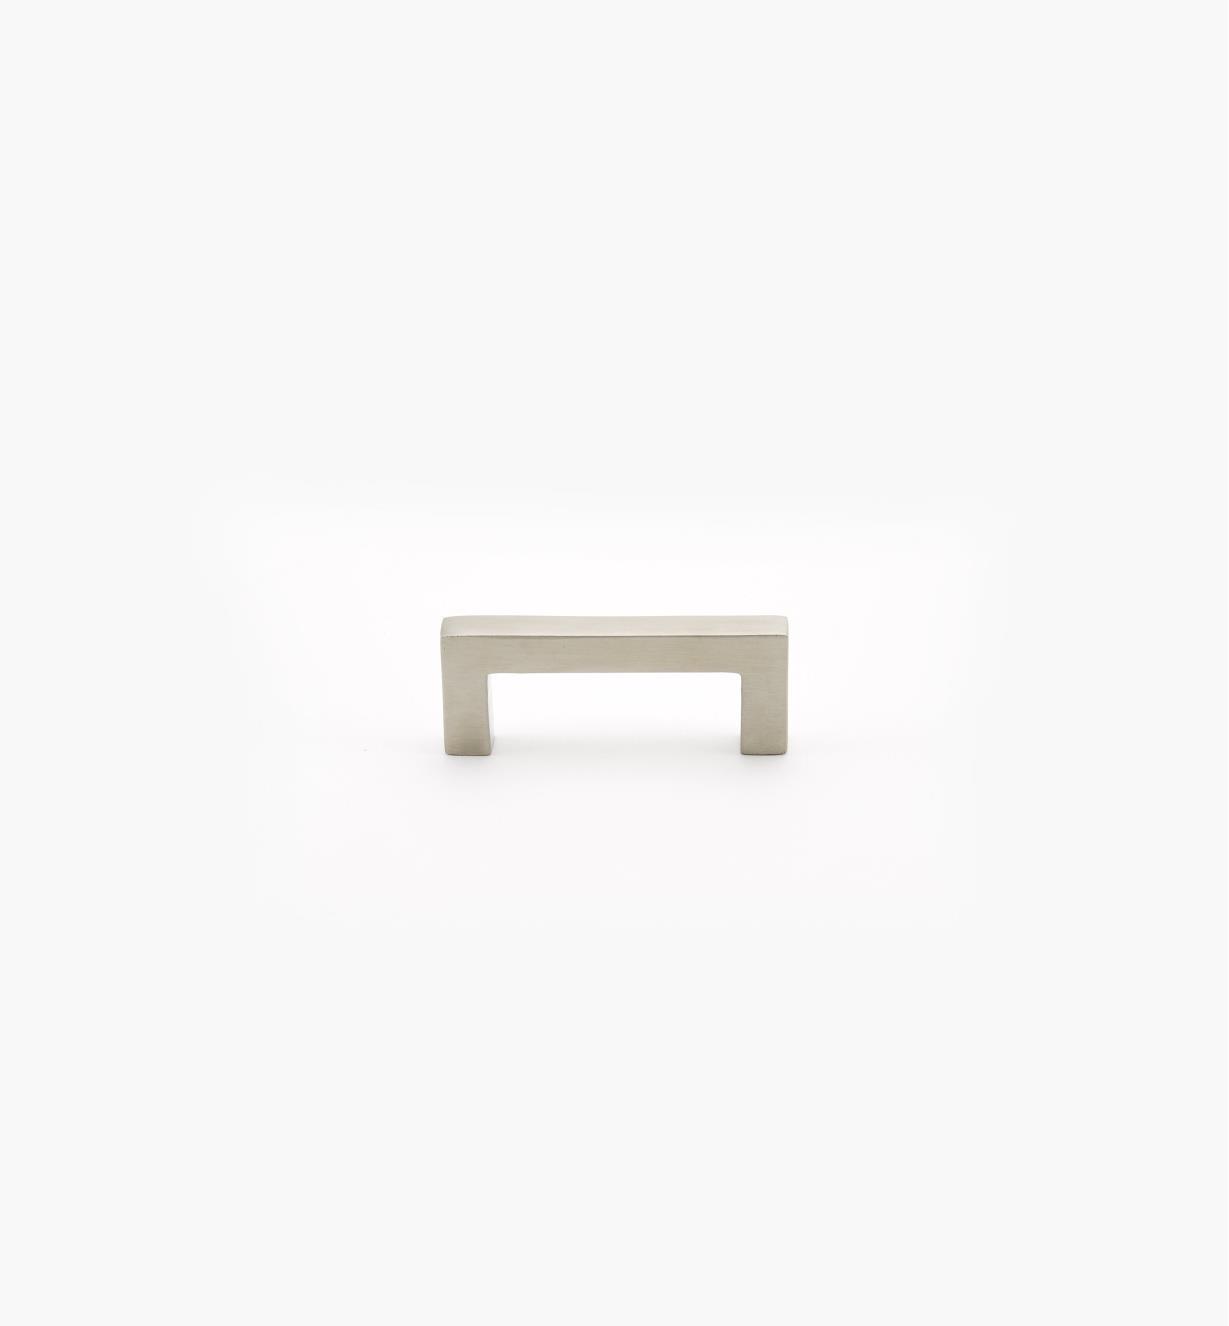 01W8410 - Poignée carrée en acier inoxydable, 64 mm